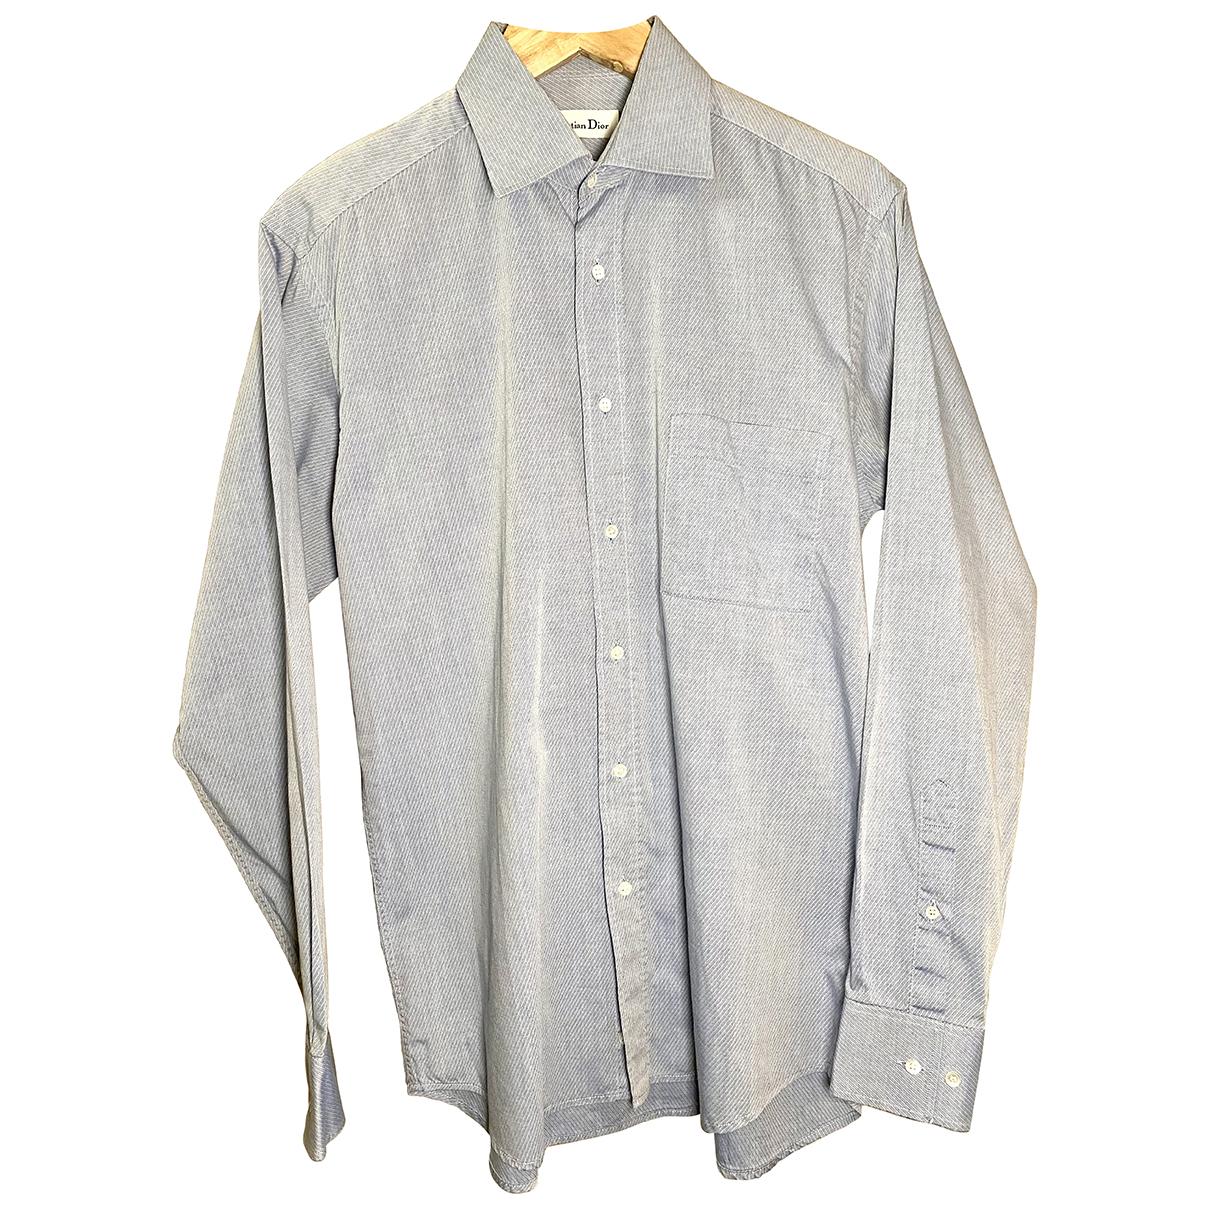 Dior N Blue Cotton Shirts for Men 38 EU (tour de cou / collar)